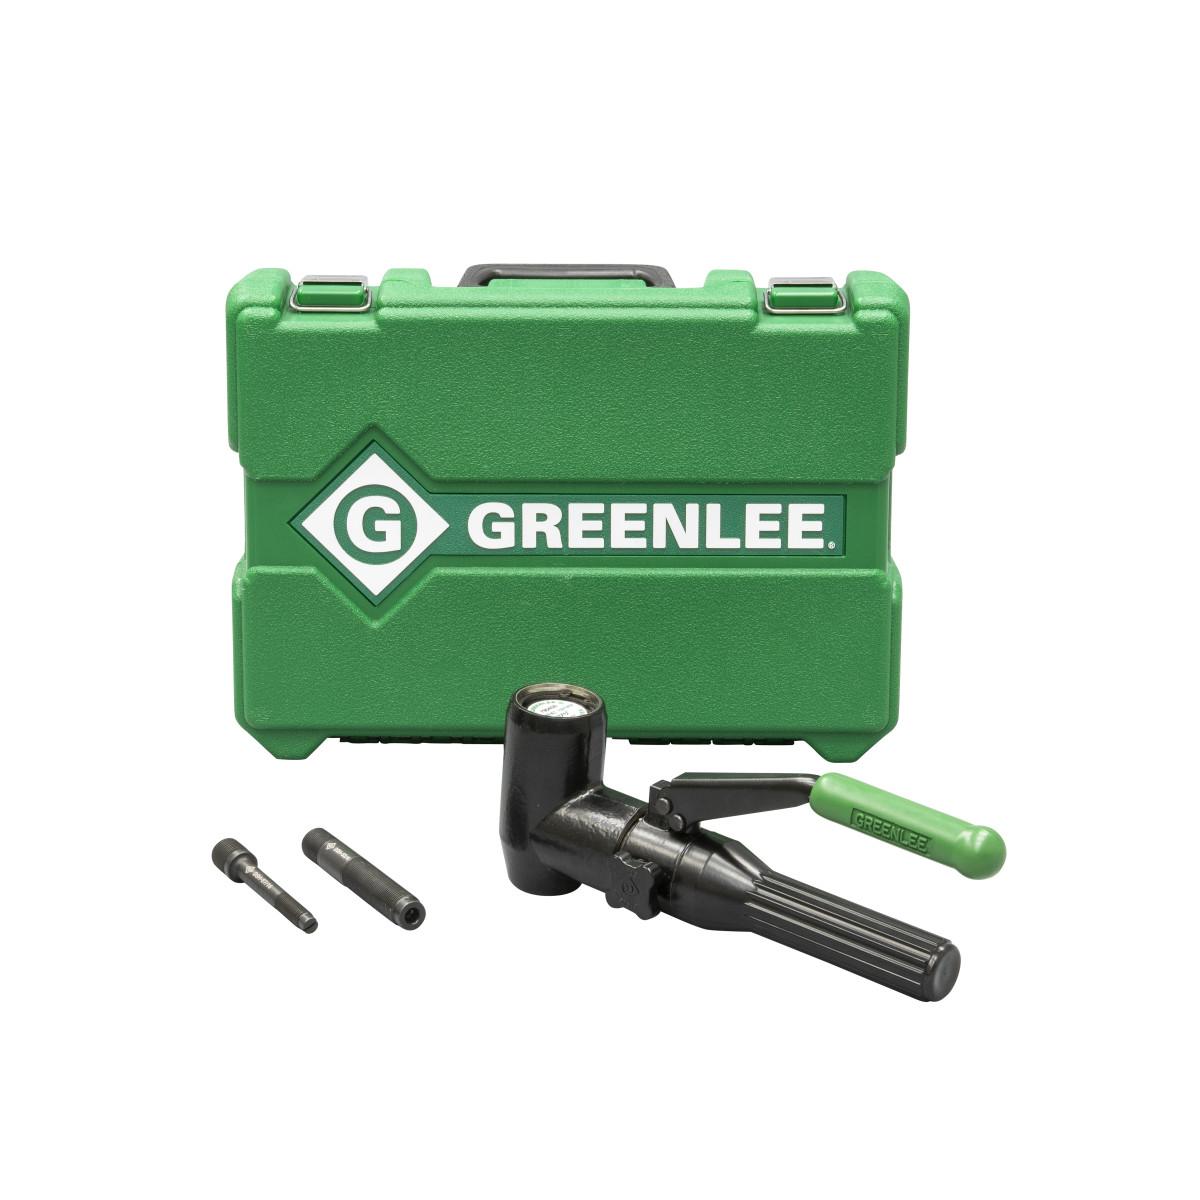 Greenlee 7904SB Driver Set Right Angle (7904Sb)